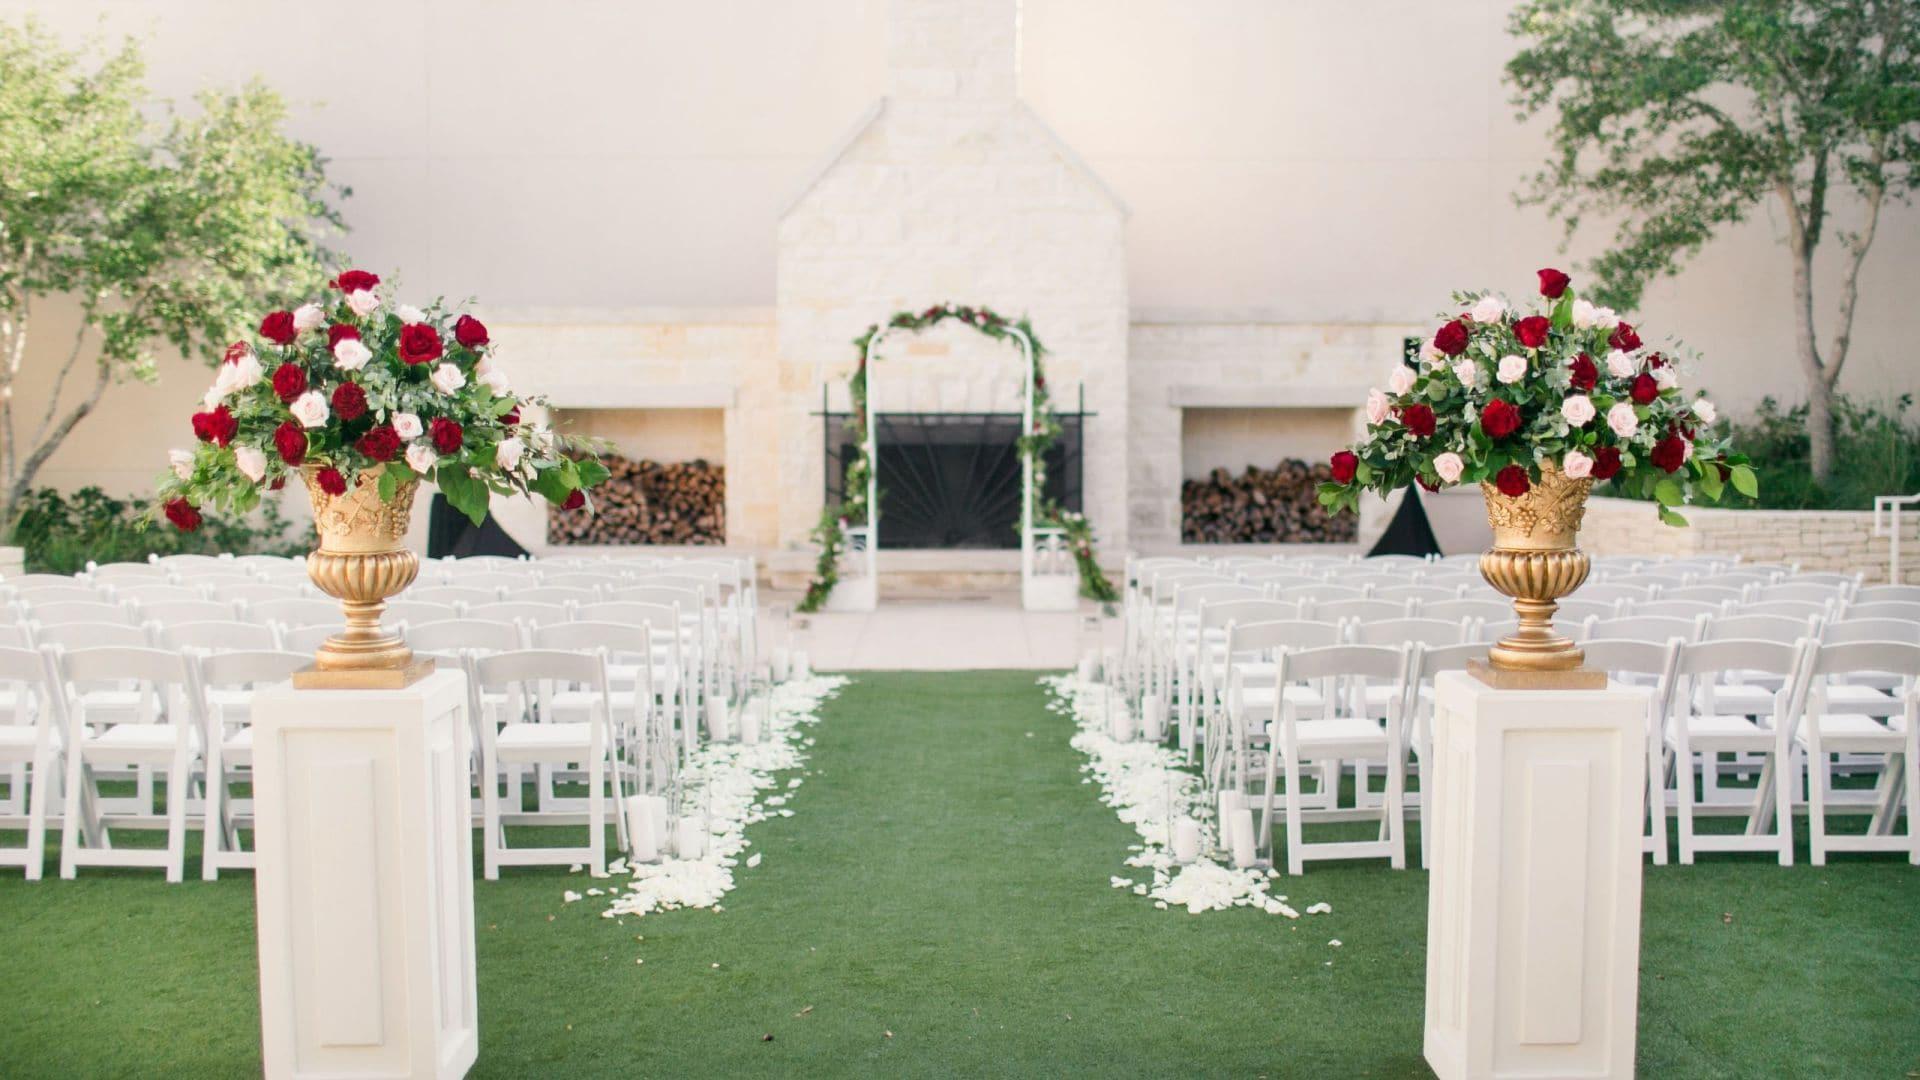 Weddings Windmill Plaza Ceremony Setup